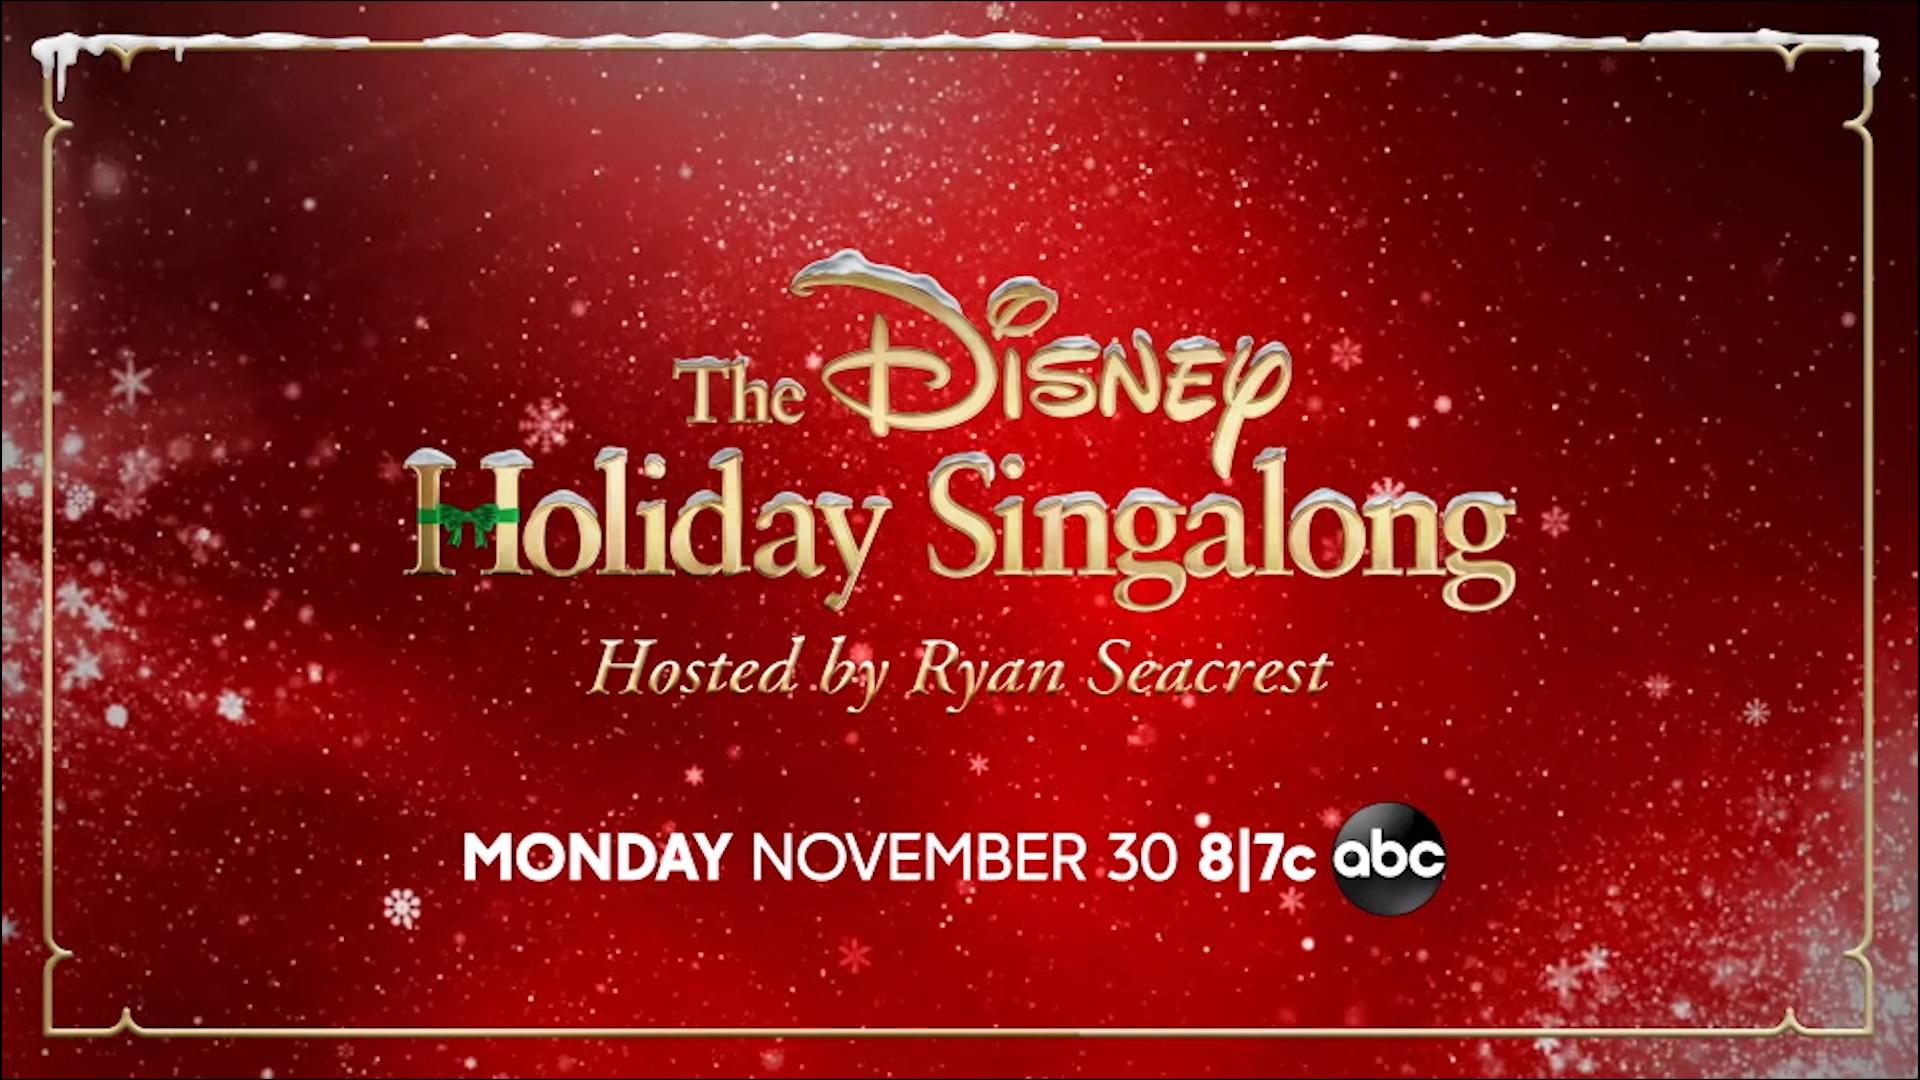 Disney Holiday Singalong on ABC: Lineup includes BTS, Michael Buble, Ciara,  more - 6abc Philadelphia